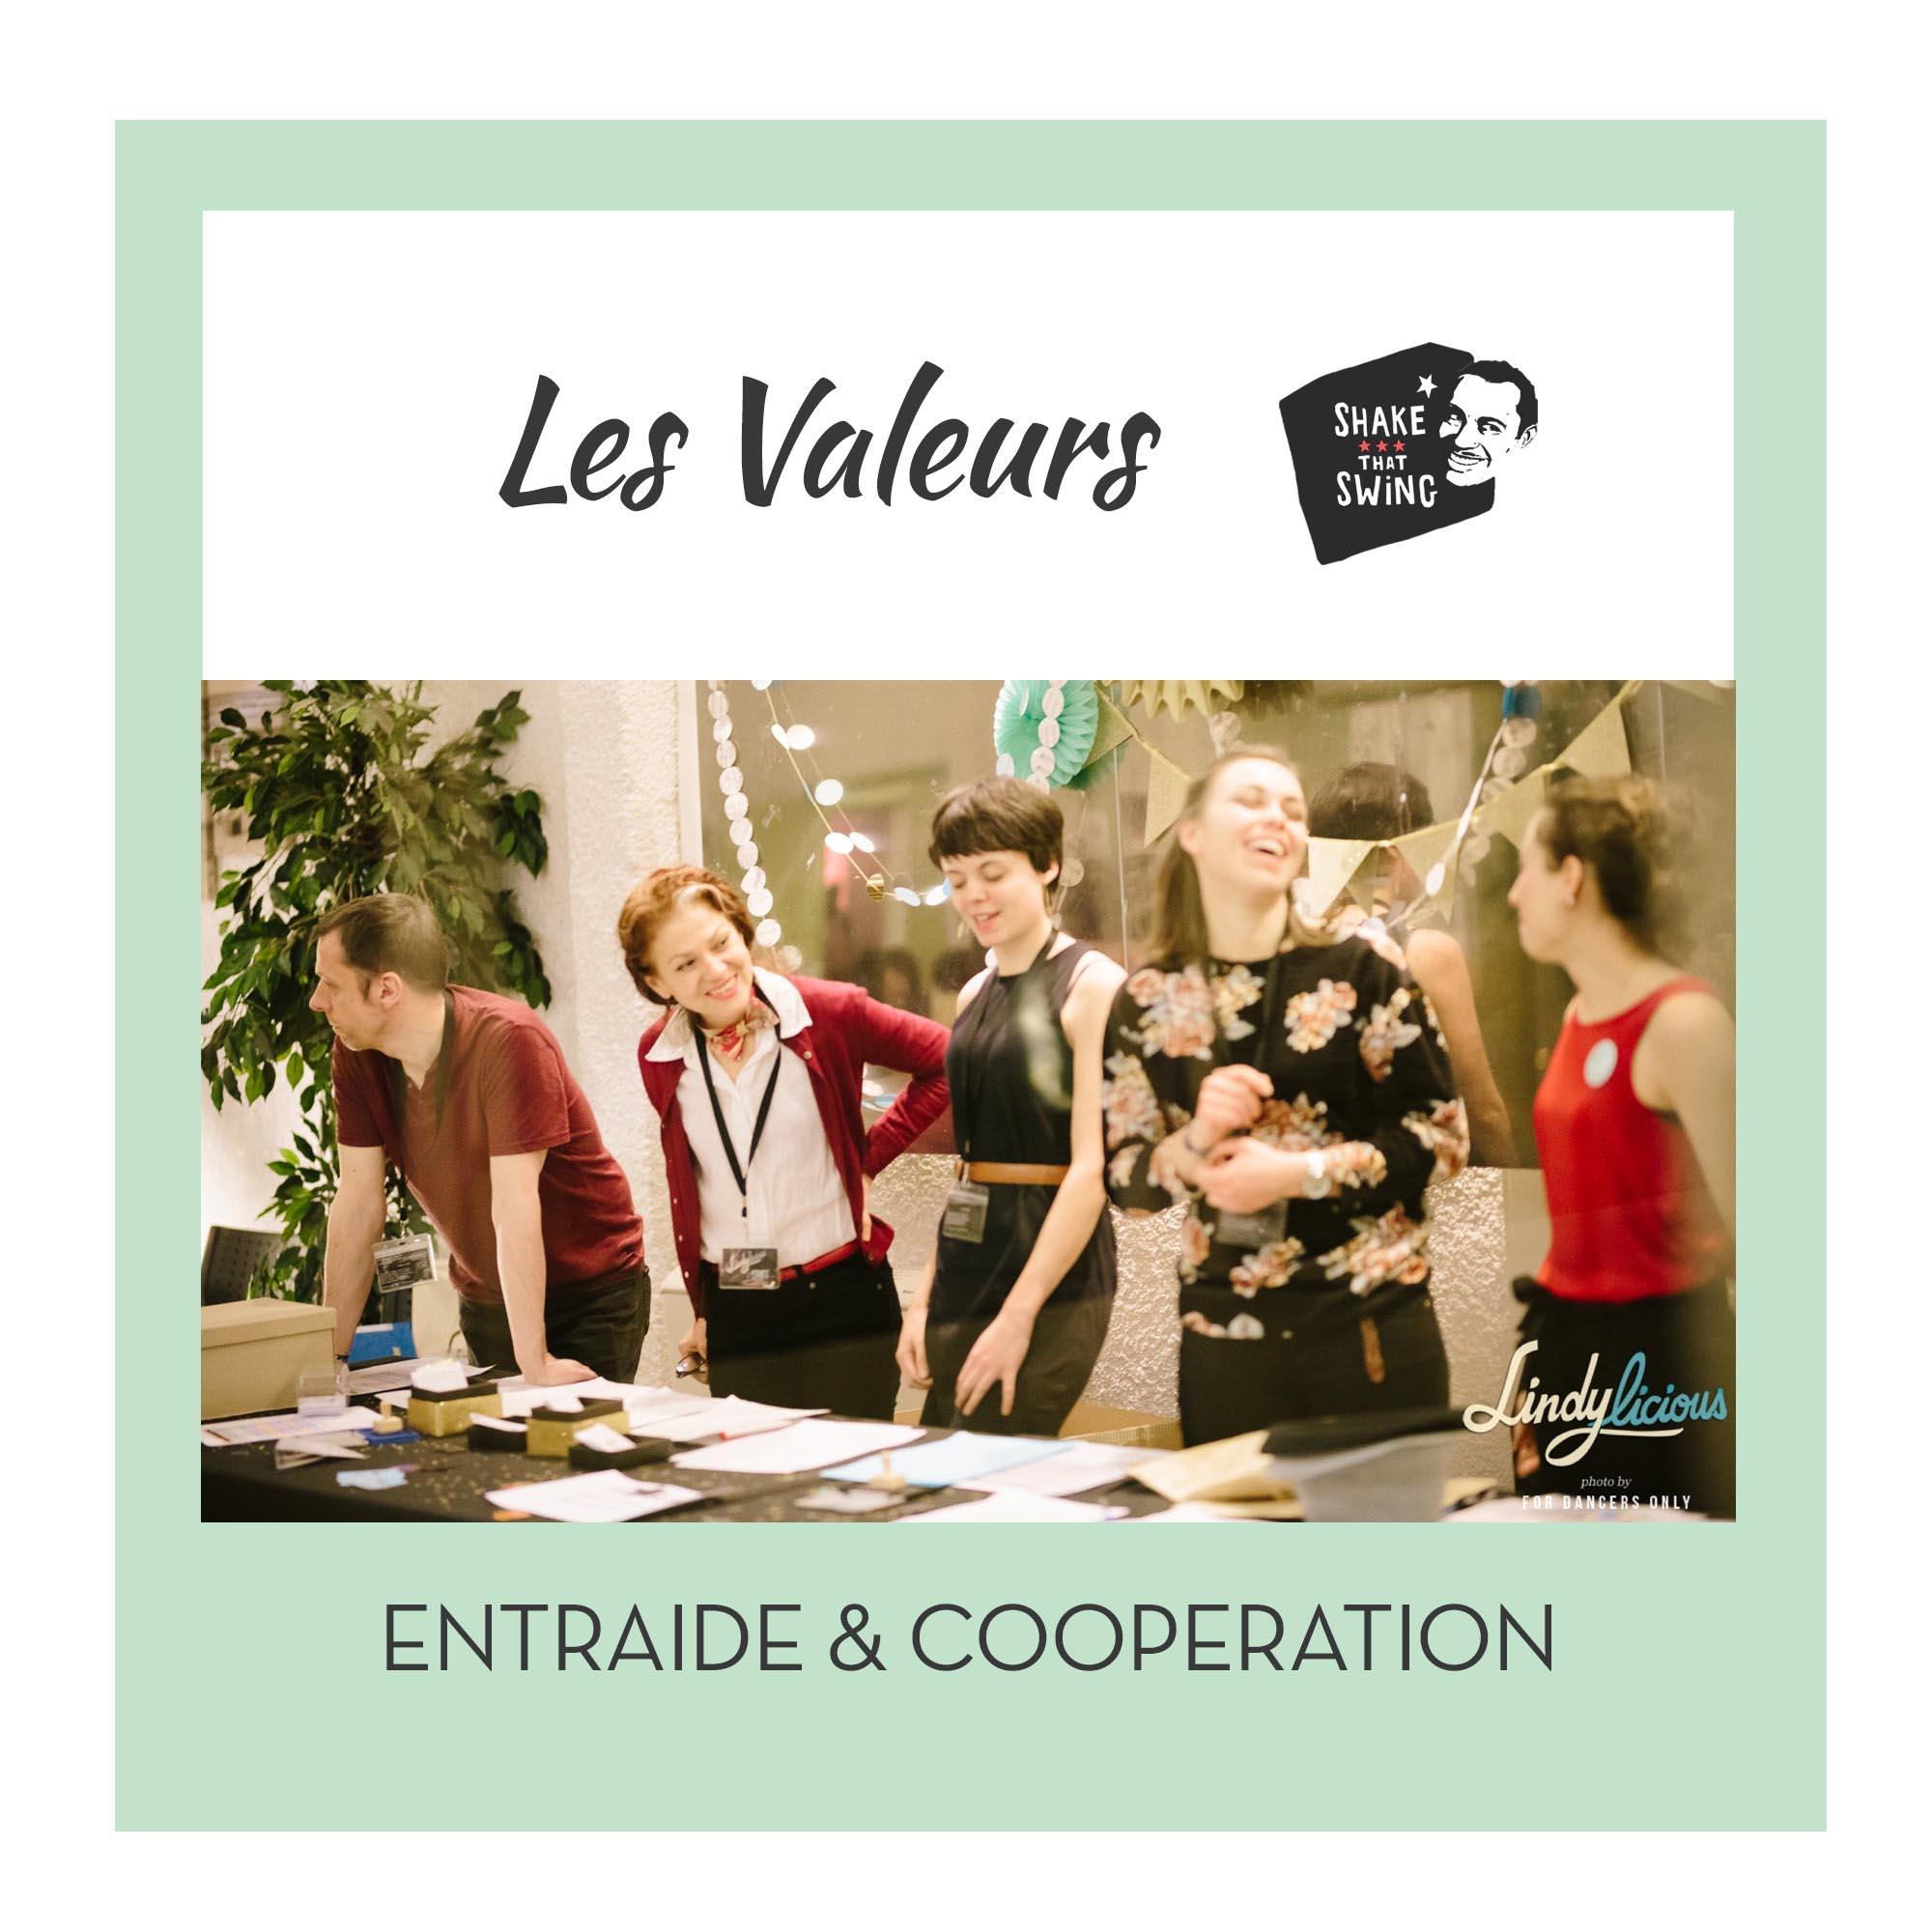 Entraide & coopération